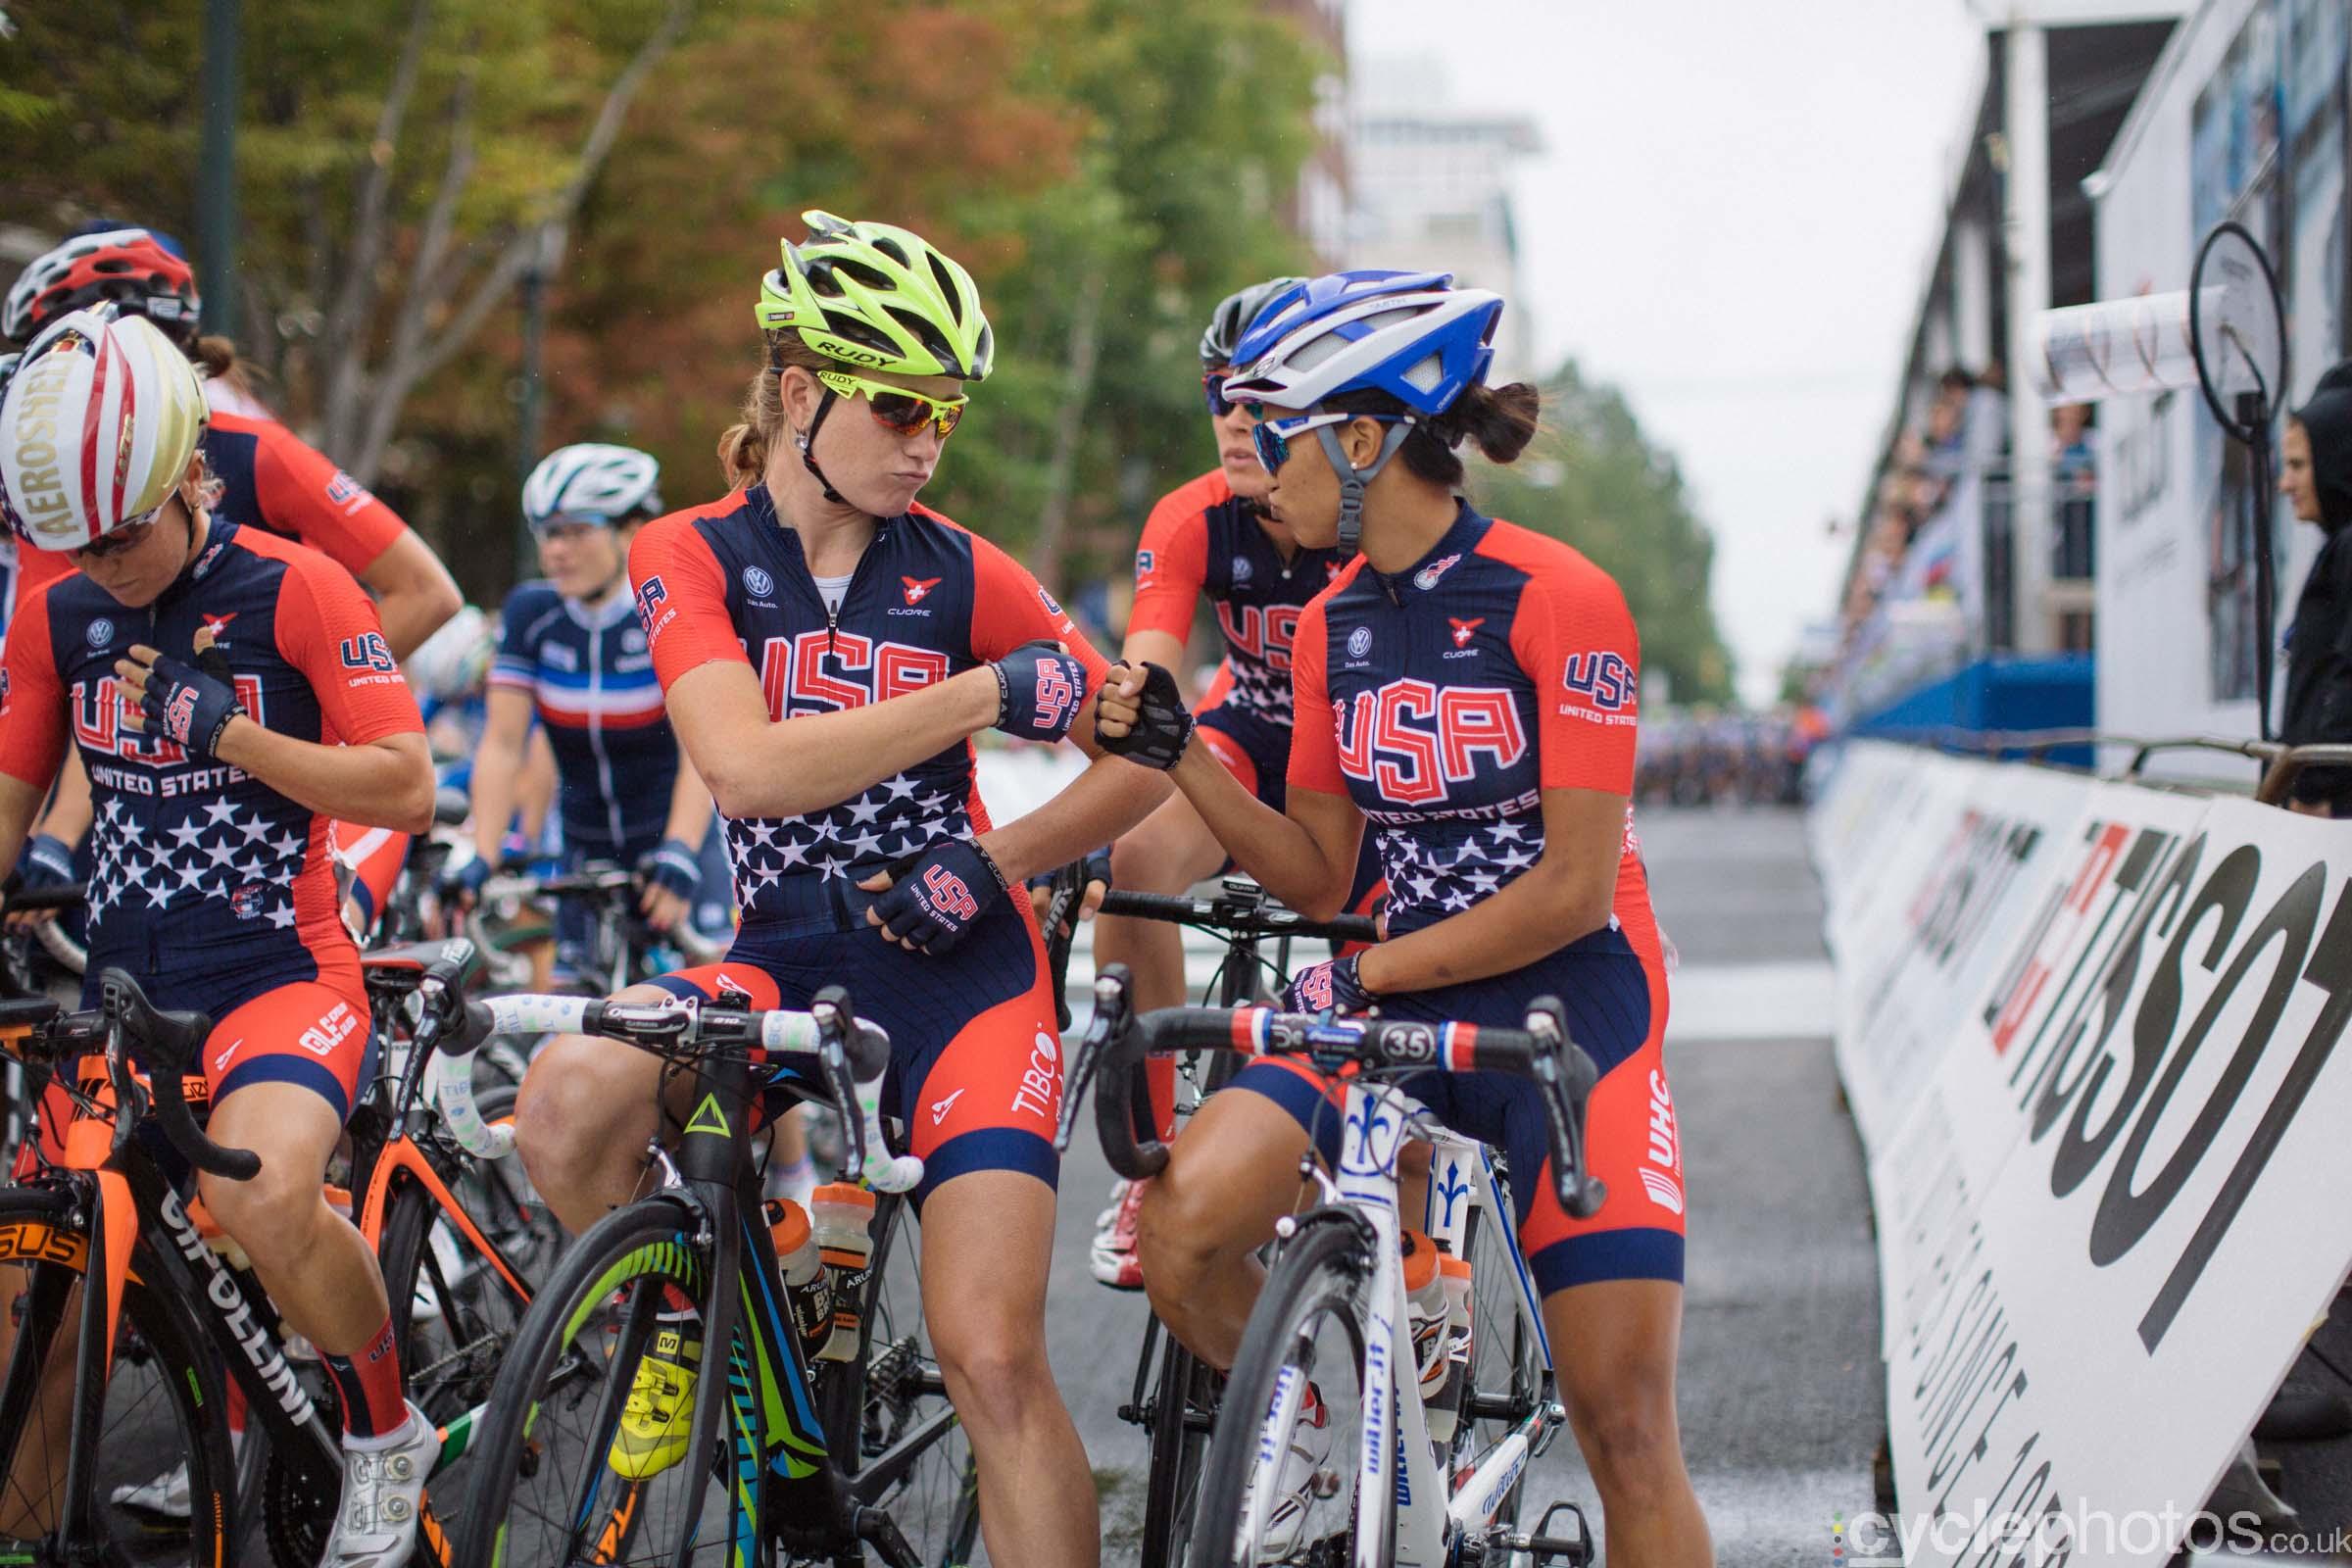 cyclephotos-world-champs-richmond-125430